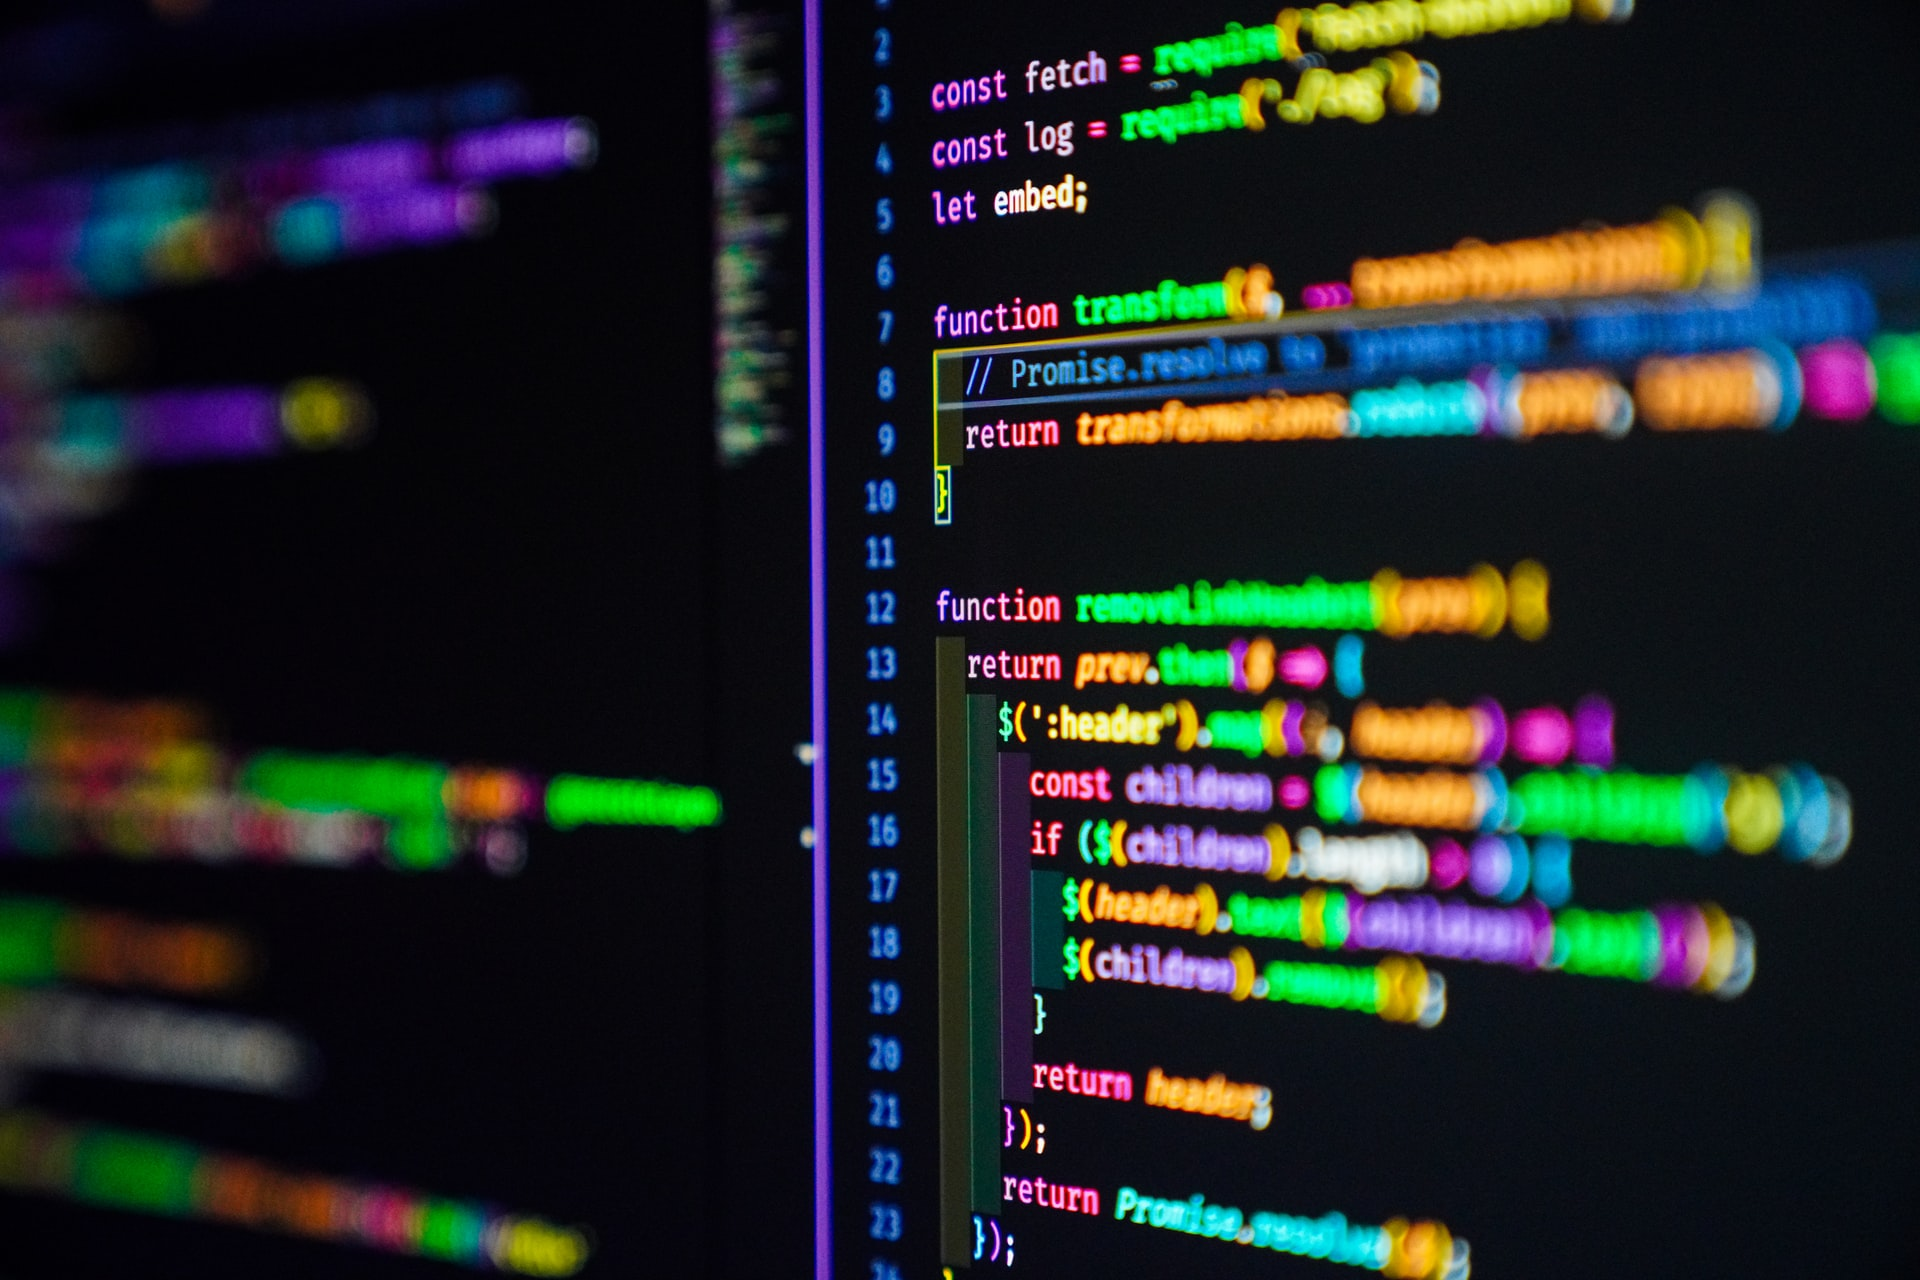 VSCodeで選択範囲や検索文字列などの背景色を変更する方法